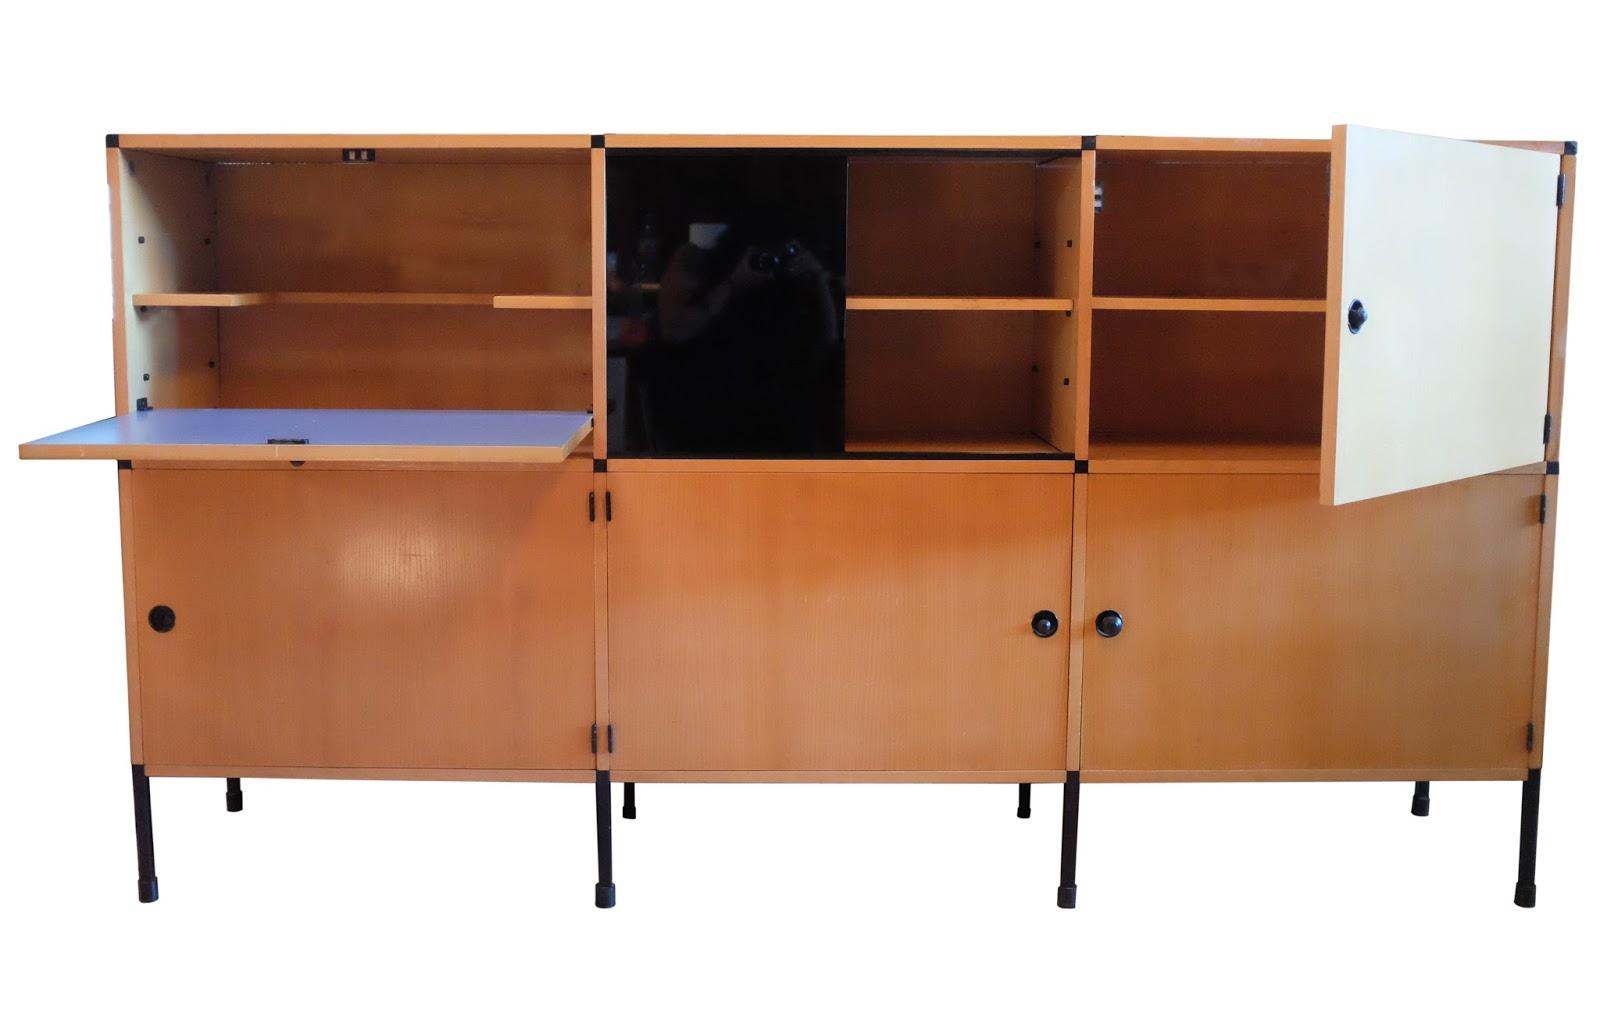 chicbaazar objets vintage 50 60 70 meubles modulable arp motte mortier guariche ditions. Black Bedroom Furniture Sets. Home Design Ideas